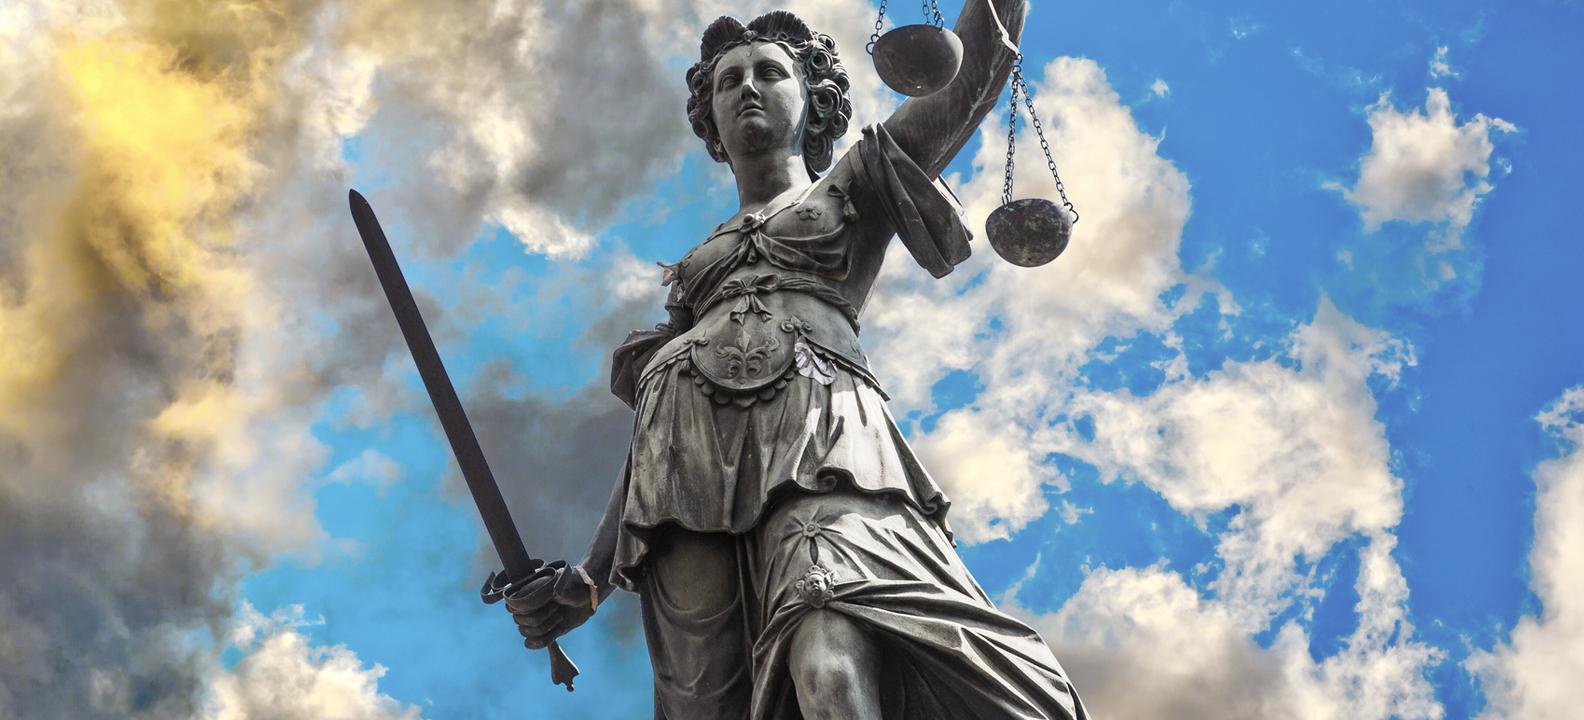 Civil Rights Law -